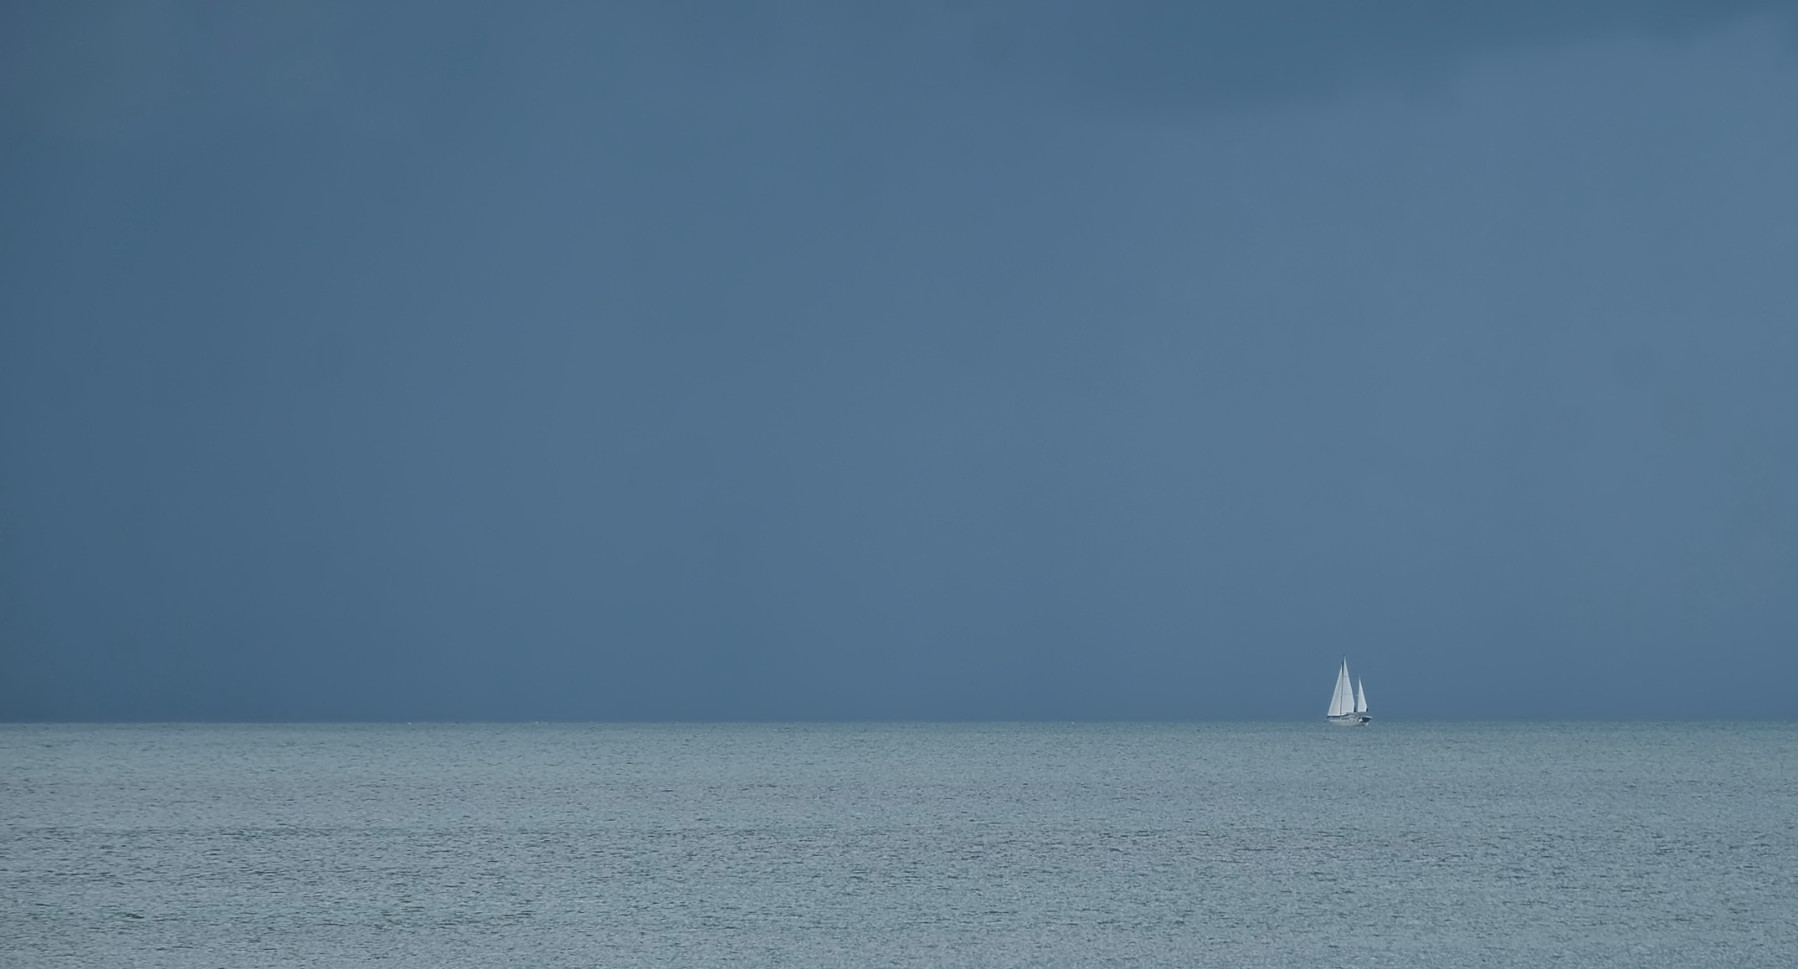 Lone yacht at sea